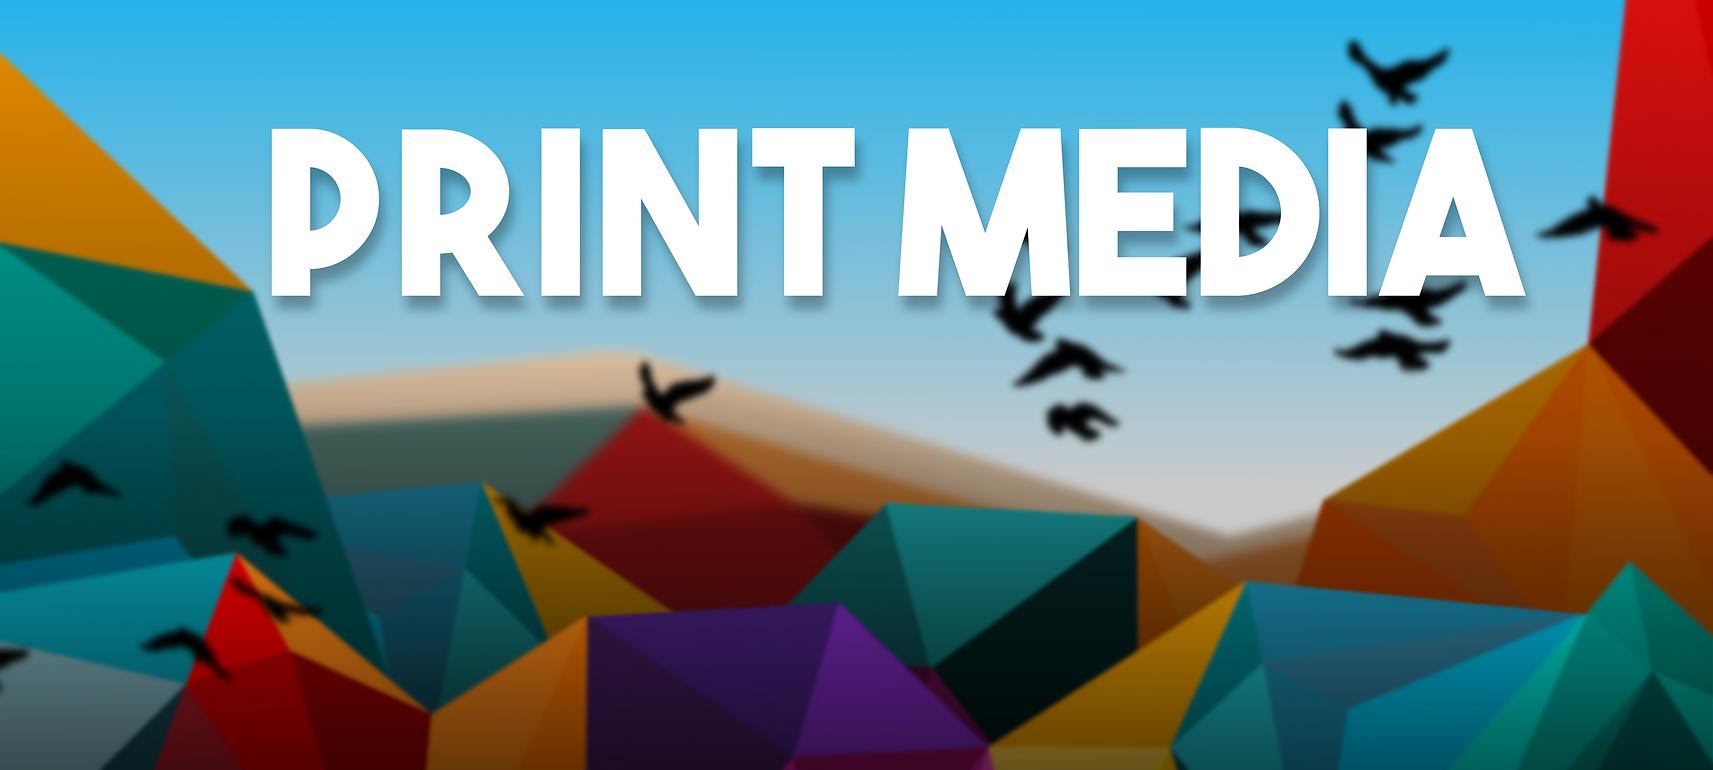 Print media bkgd.png